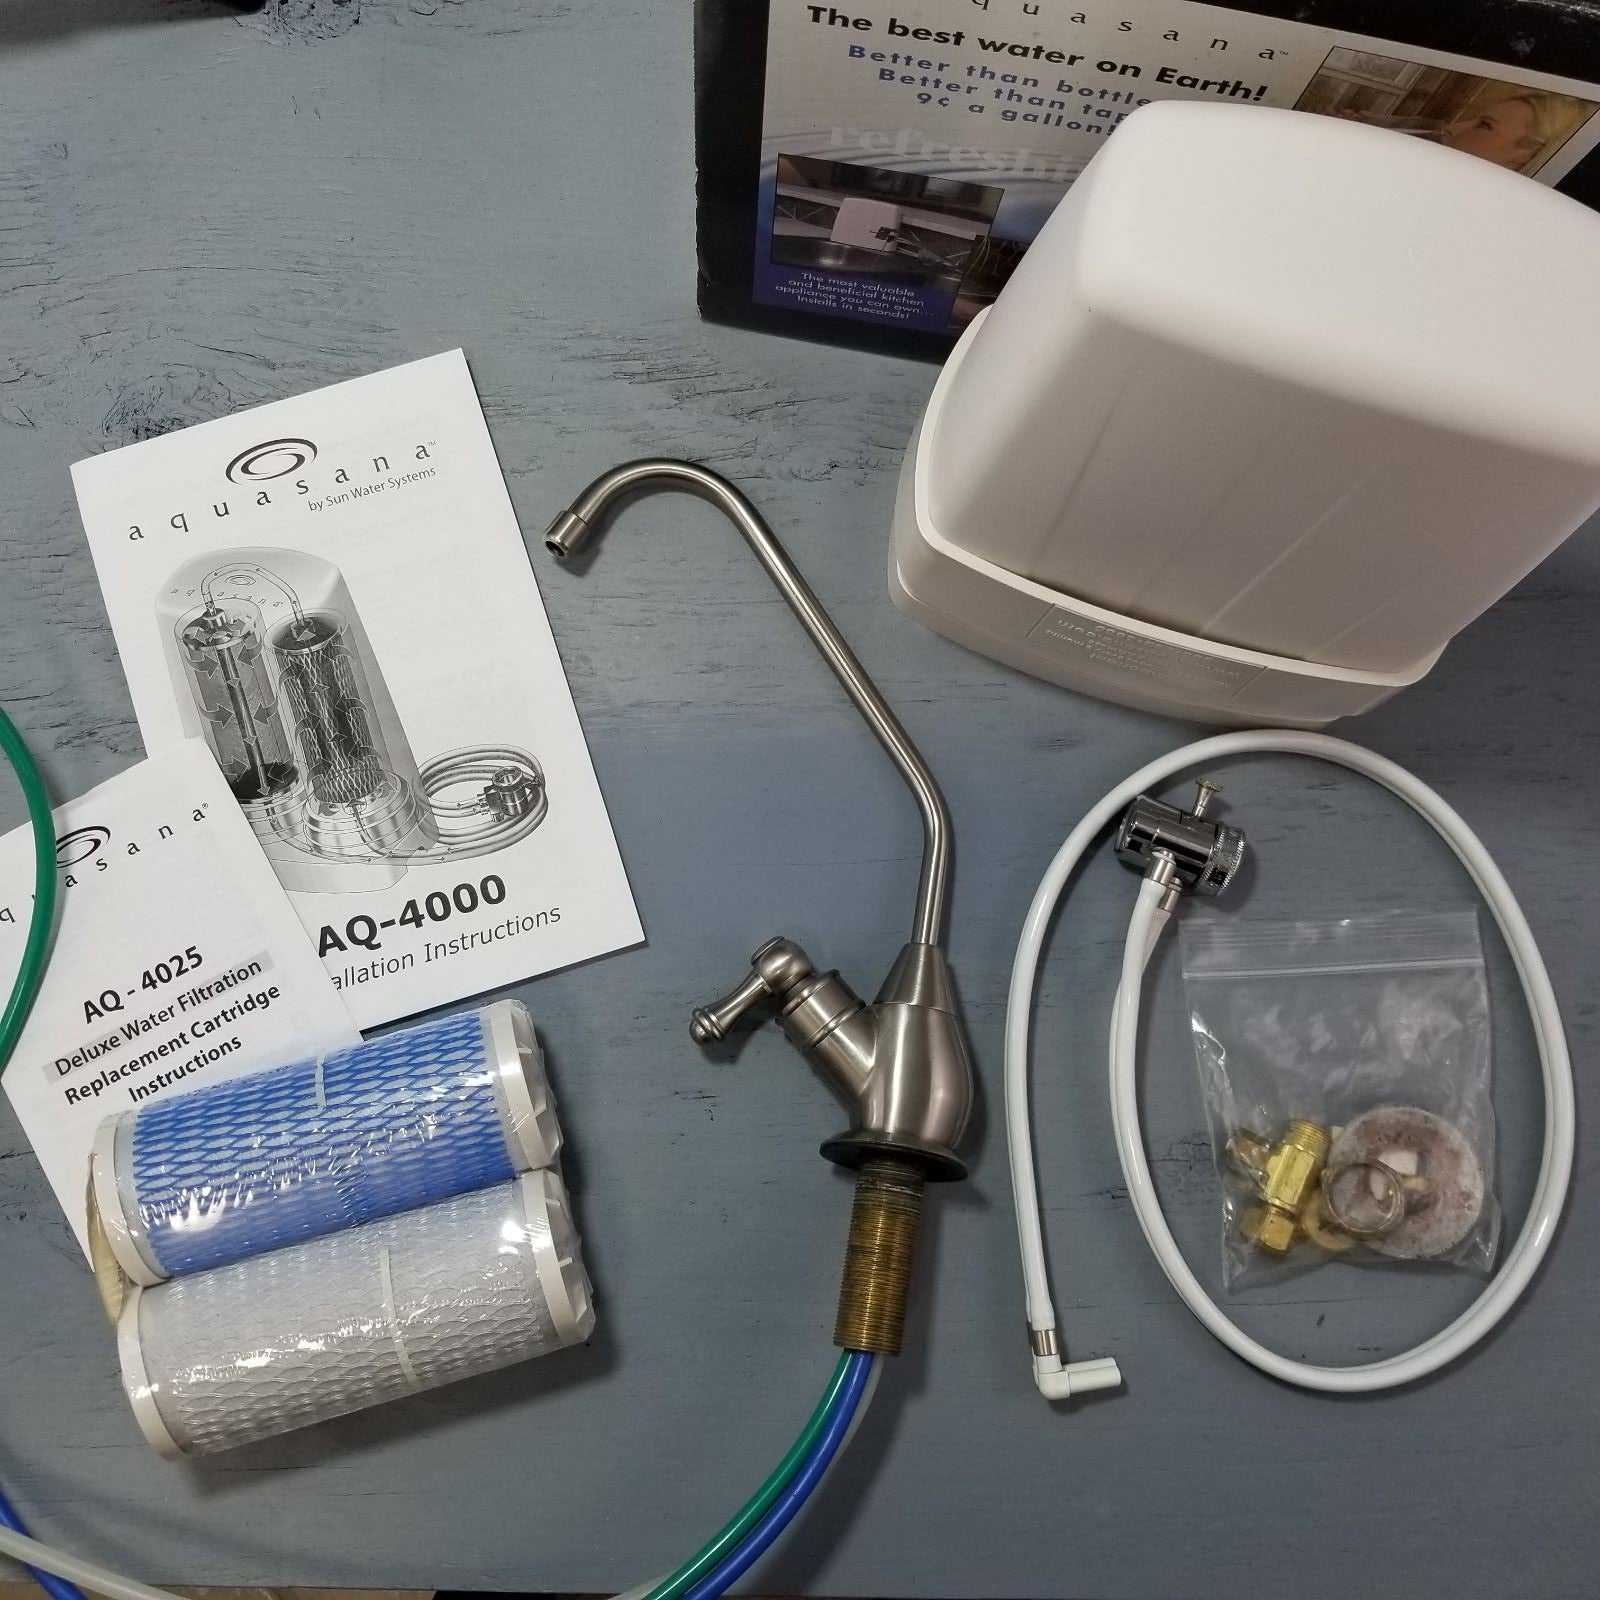 Aquasana Brushed Nickel Water Faucet